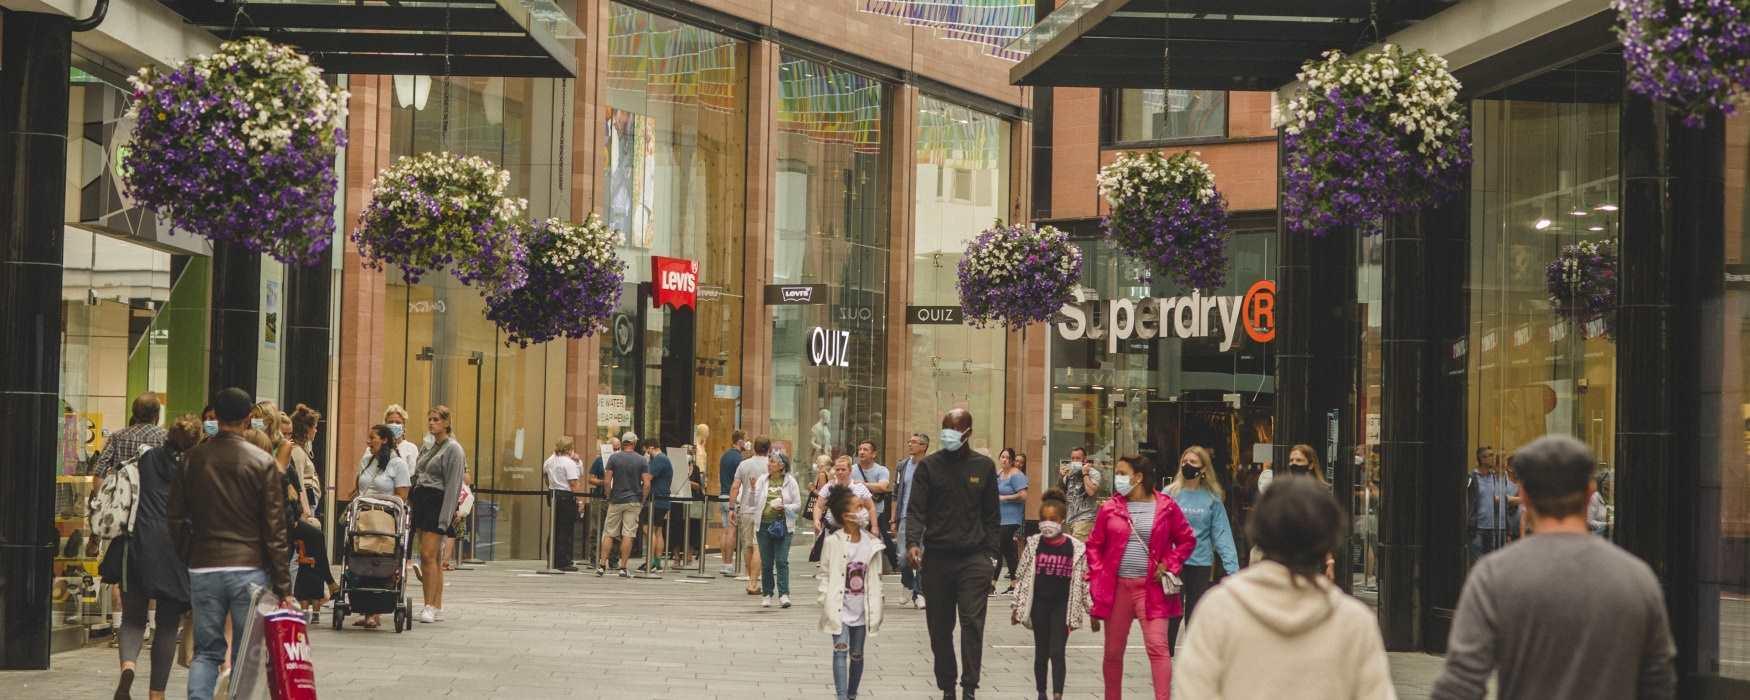 Princesshay Shopping centre